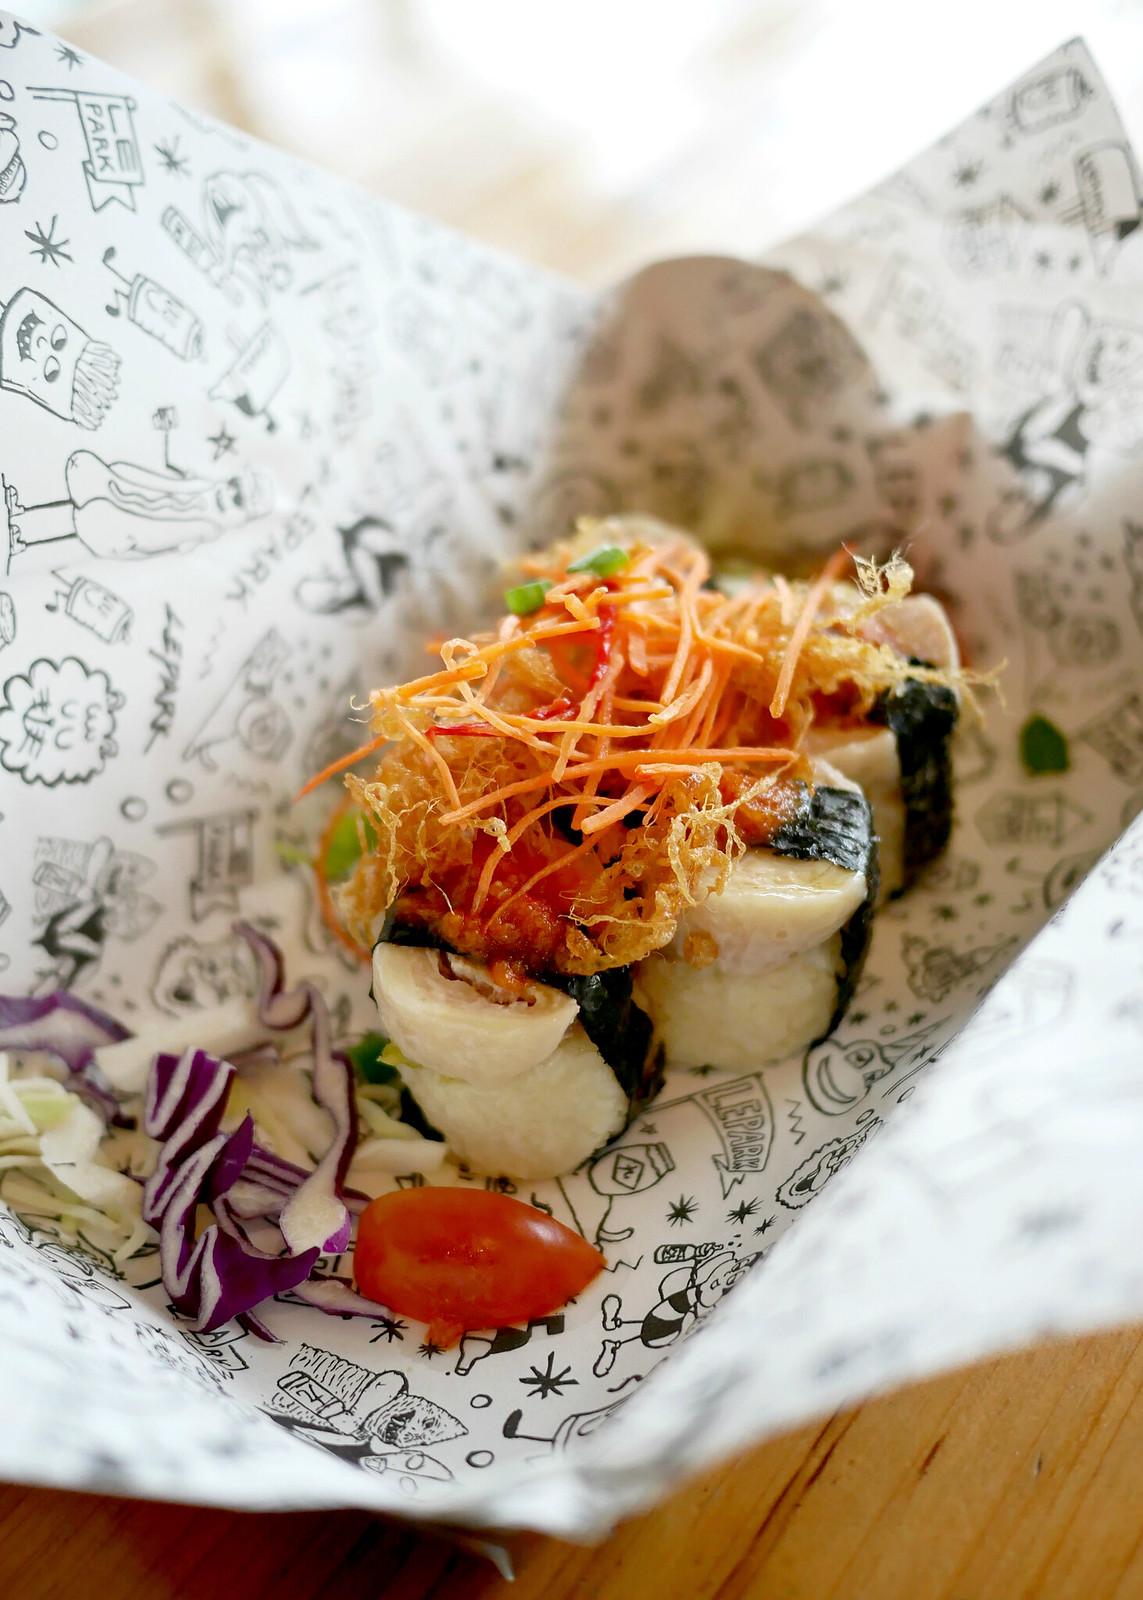 LEPARK sushi